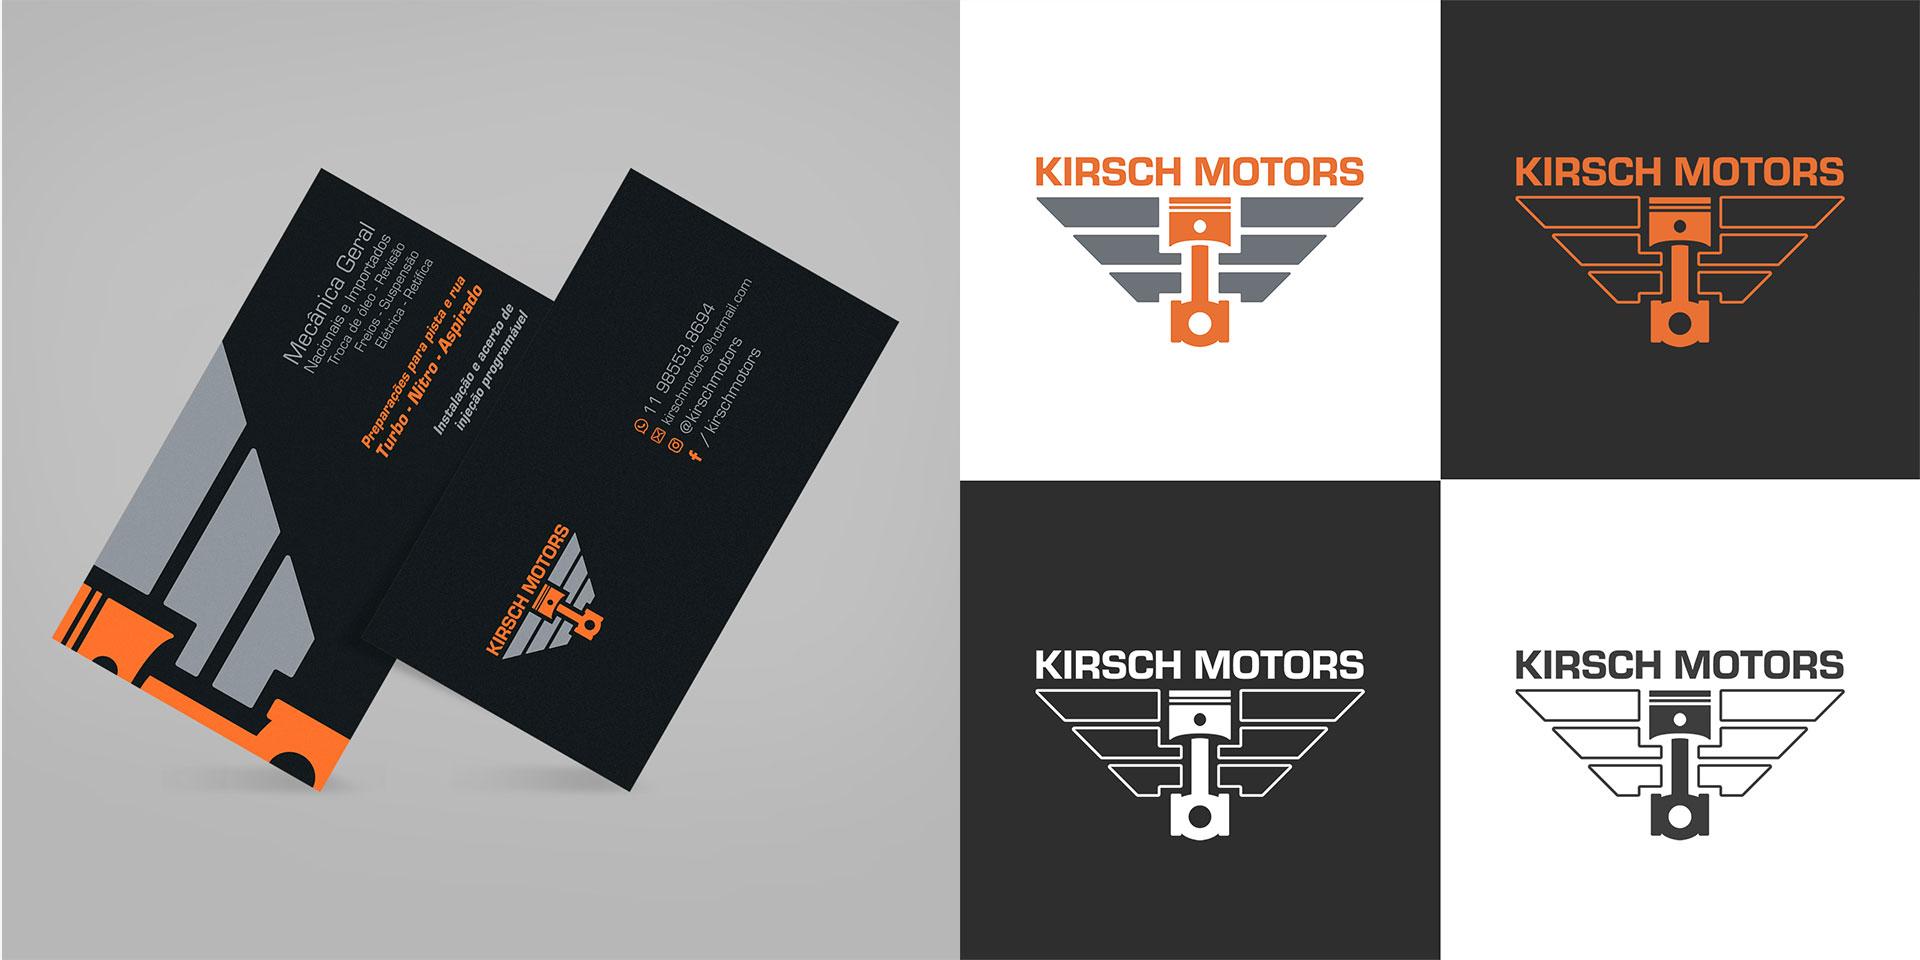 Identidade Visual Logotipo Cartão de Visitas Kirsch Motors